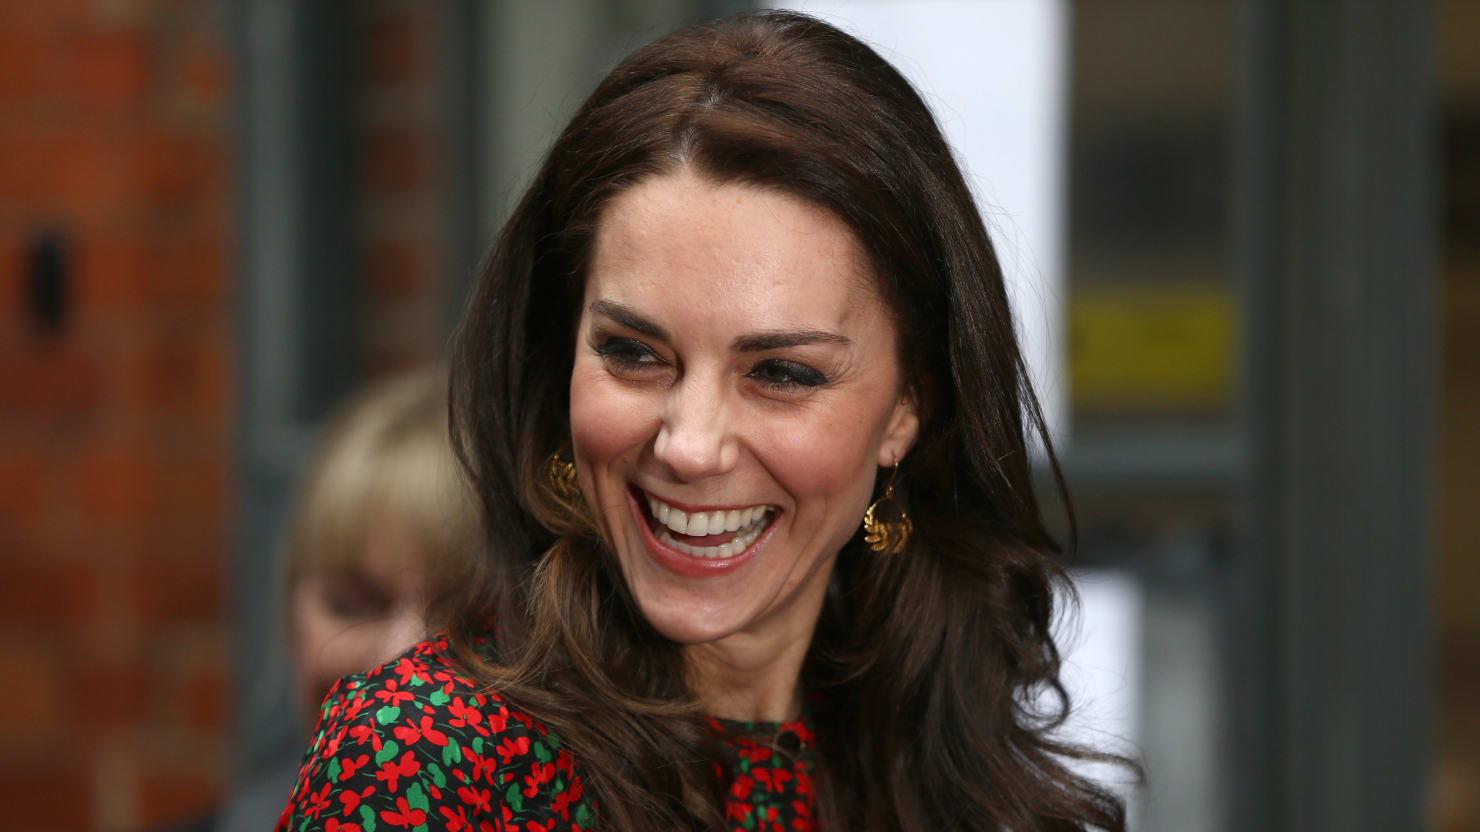 Kate middleton closer photos online PICS Kate Middleton Photo Scandal Topless Photos In Closer